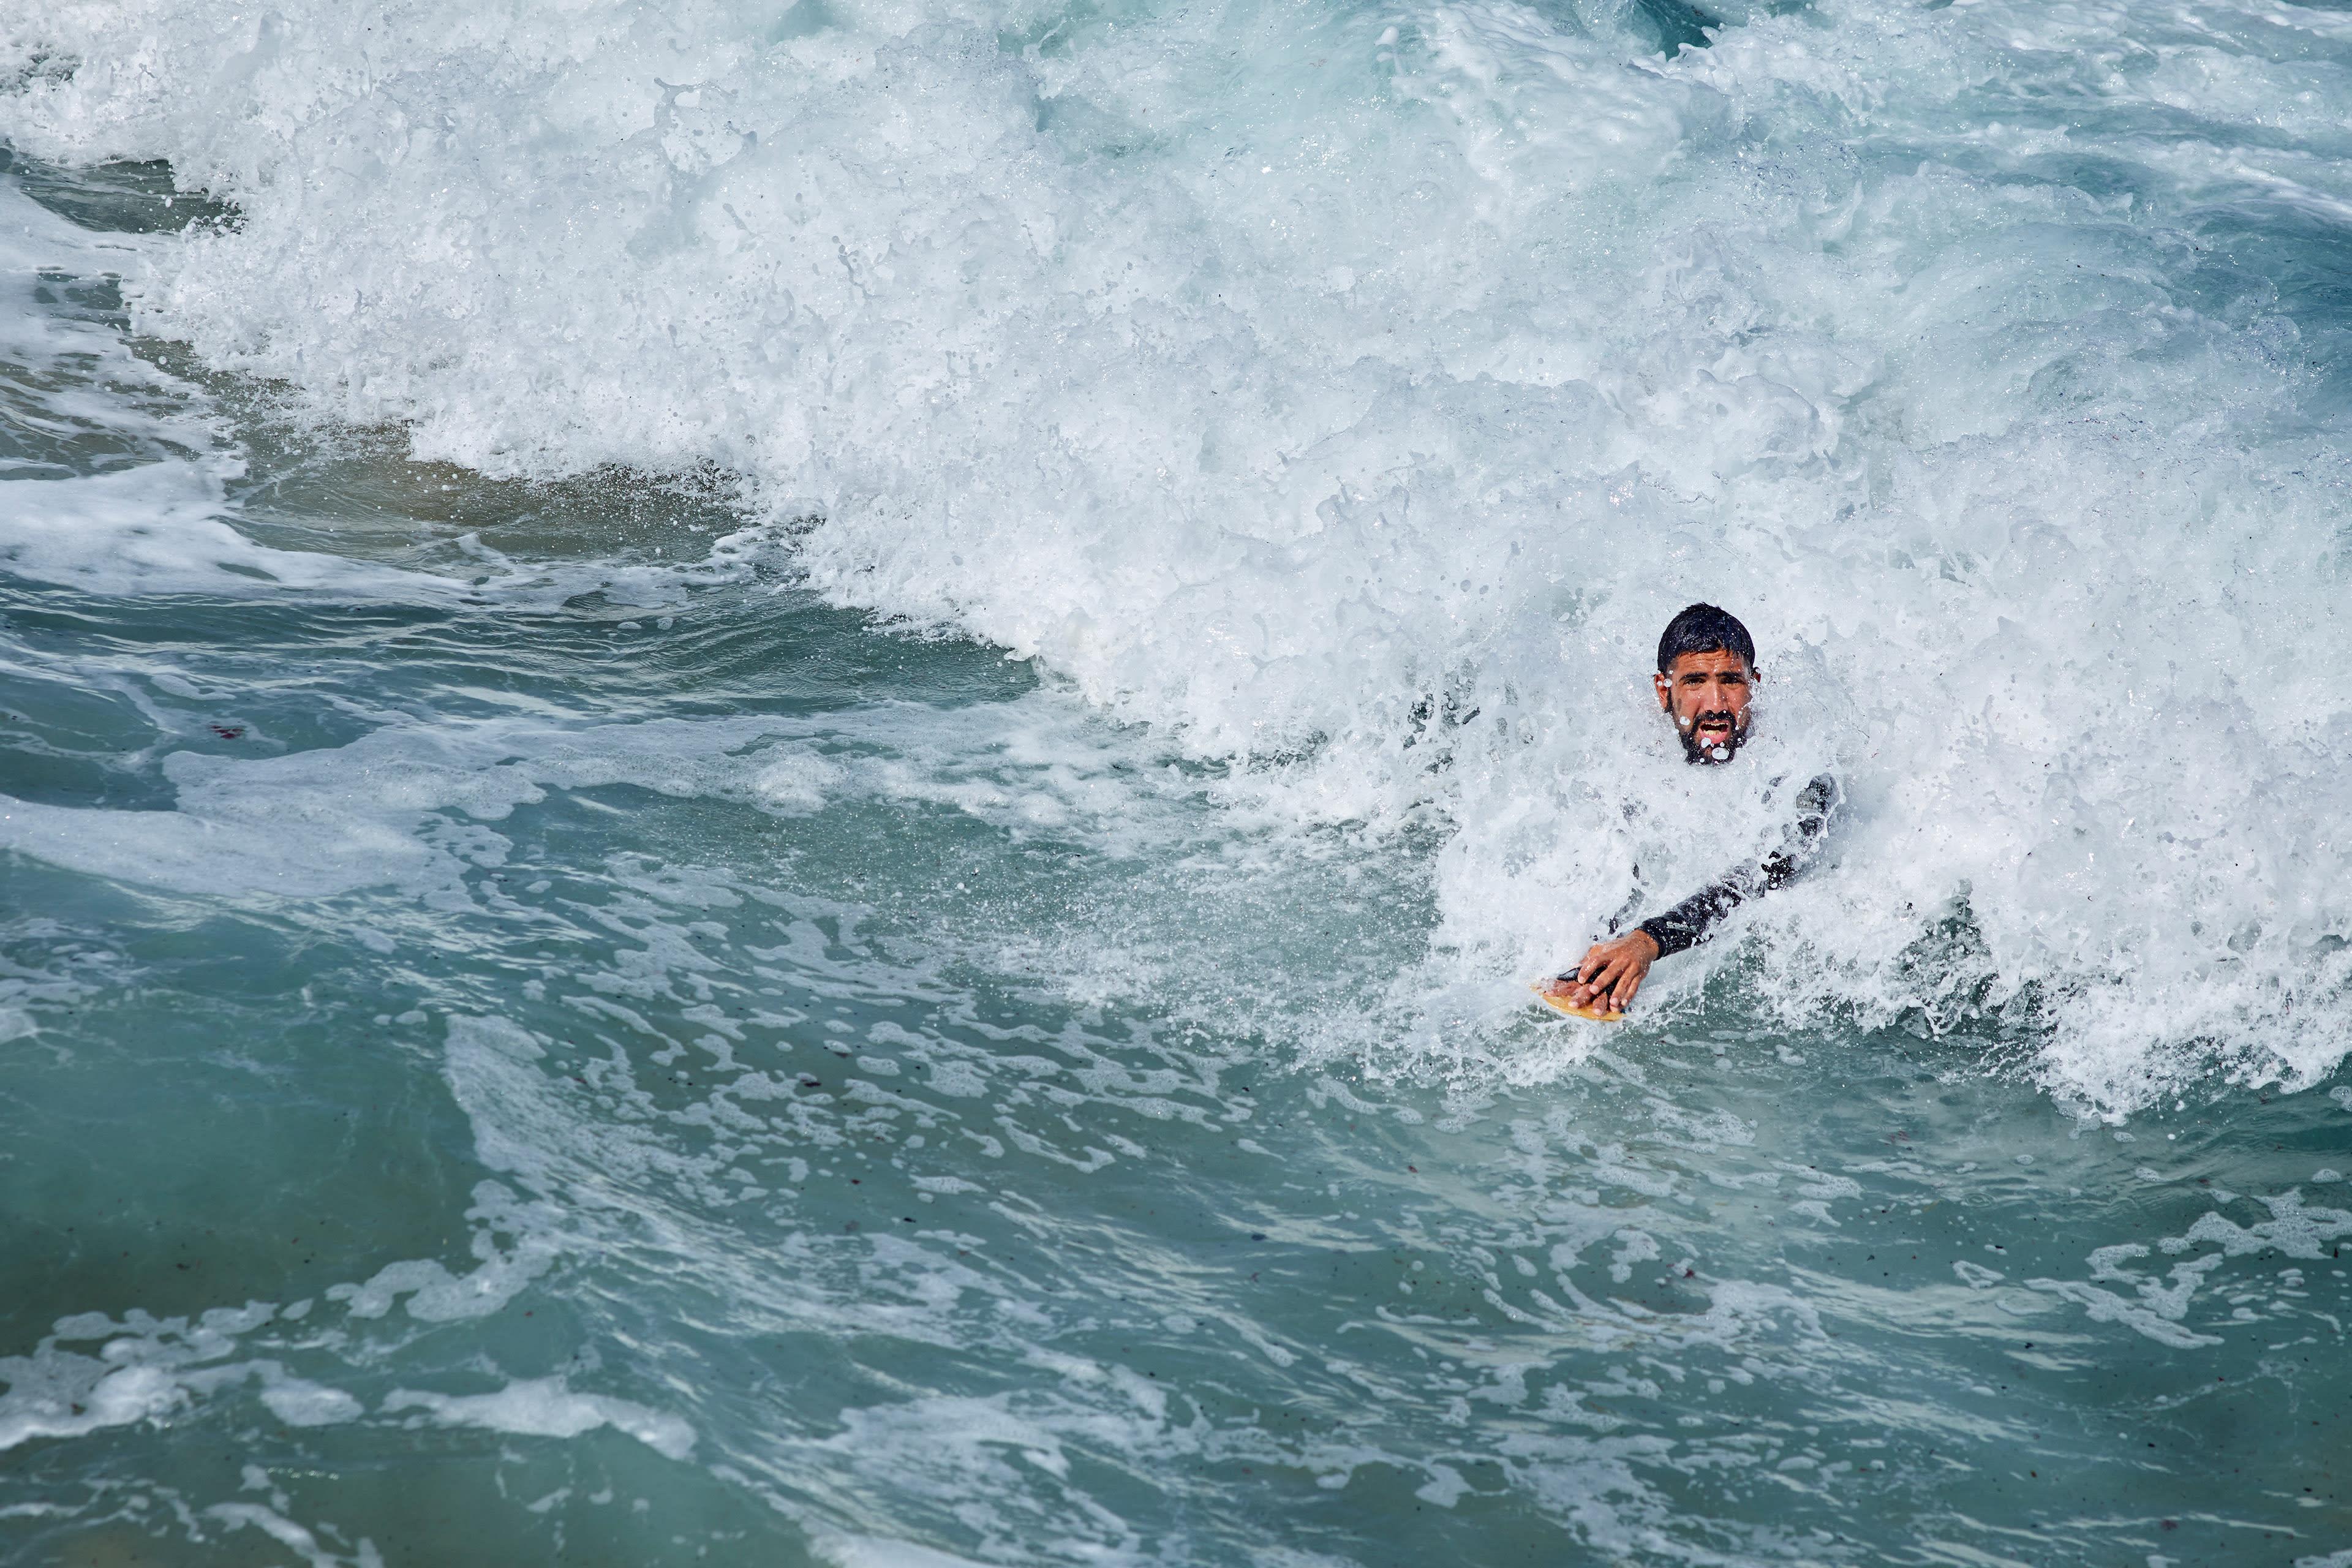 Richard Moran Beech Surf Skate Personal 013